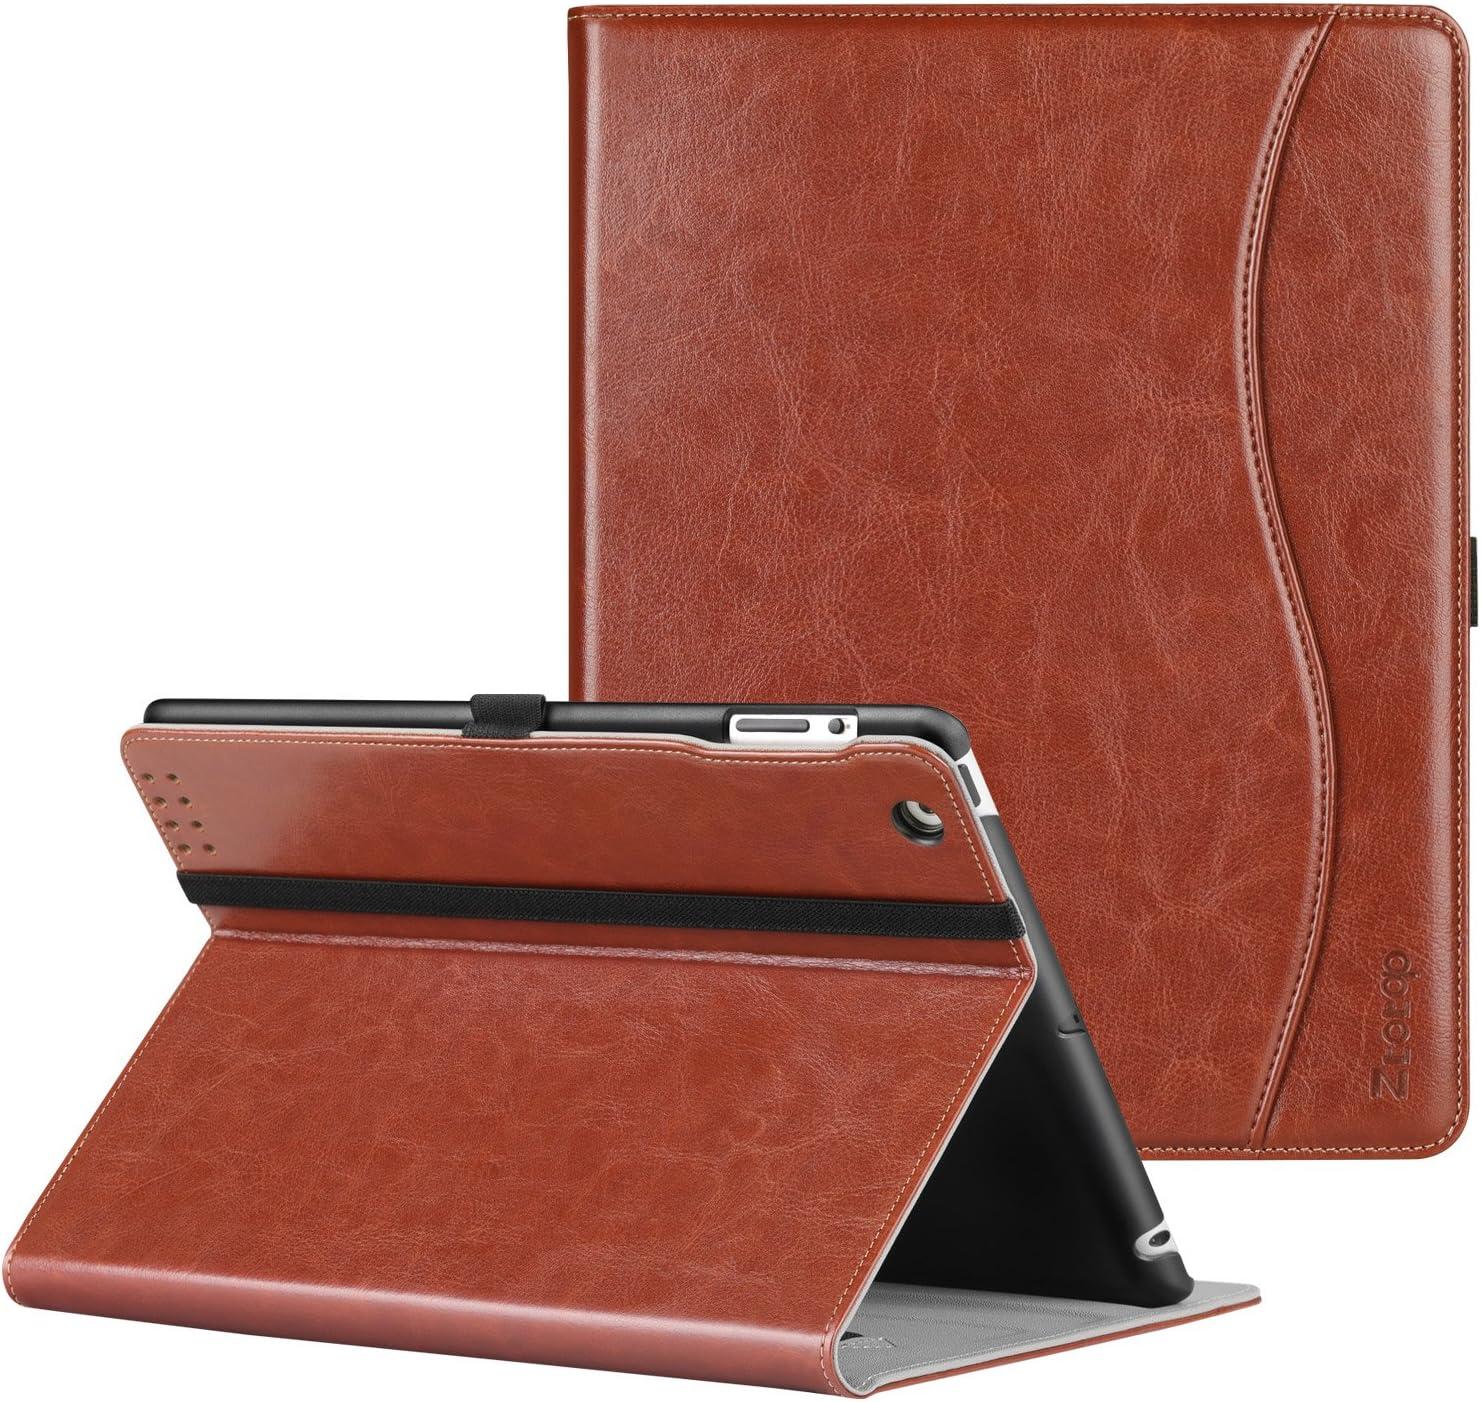 Ztotop Case for iPad 2/3/4 - Premium PU Leather Business Slim Folding Stand Folio Cover with Auto Wake/Sleep for iPad 4th Generation with Retina Display, iPad 3, iPad 2,Brown